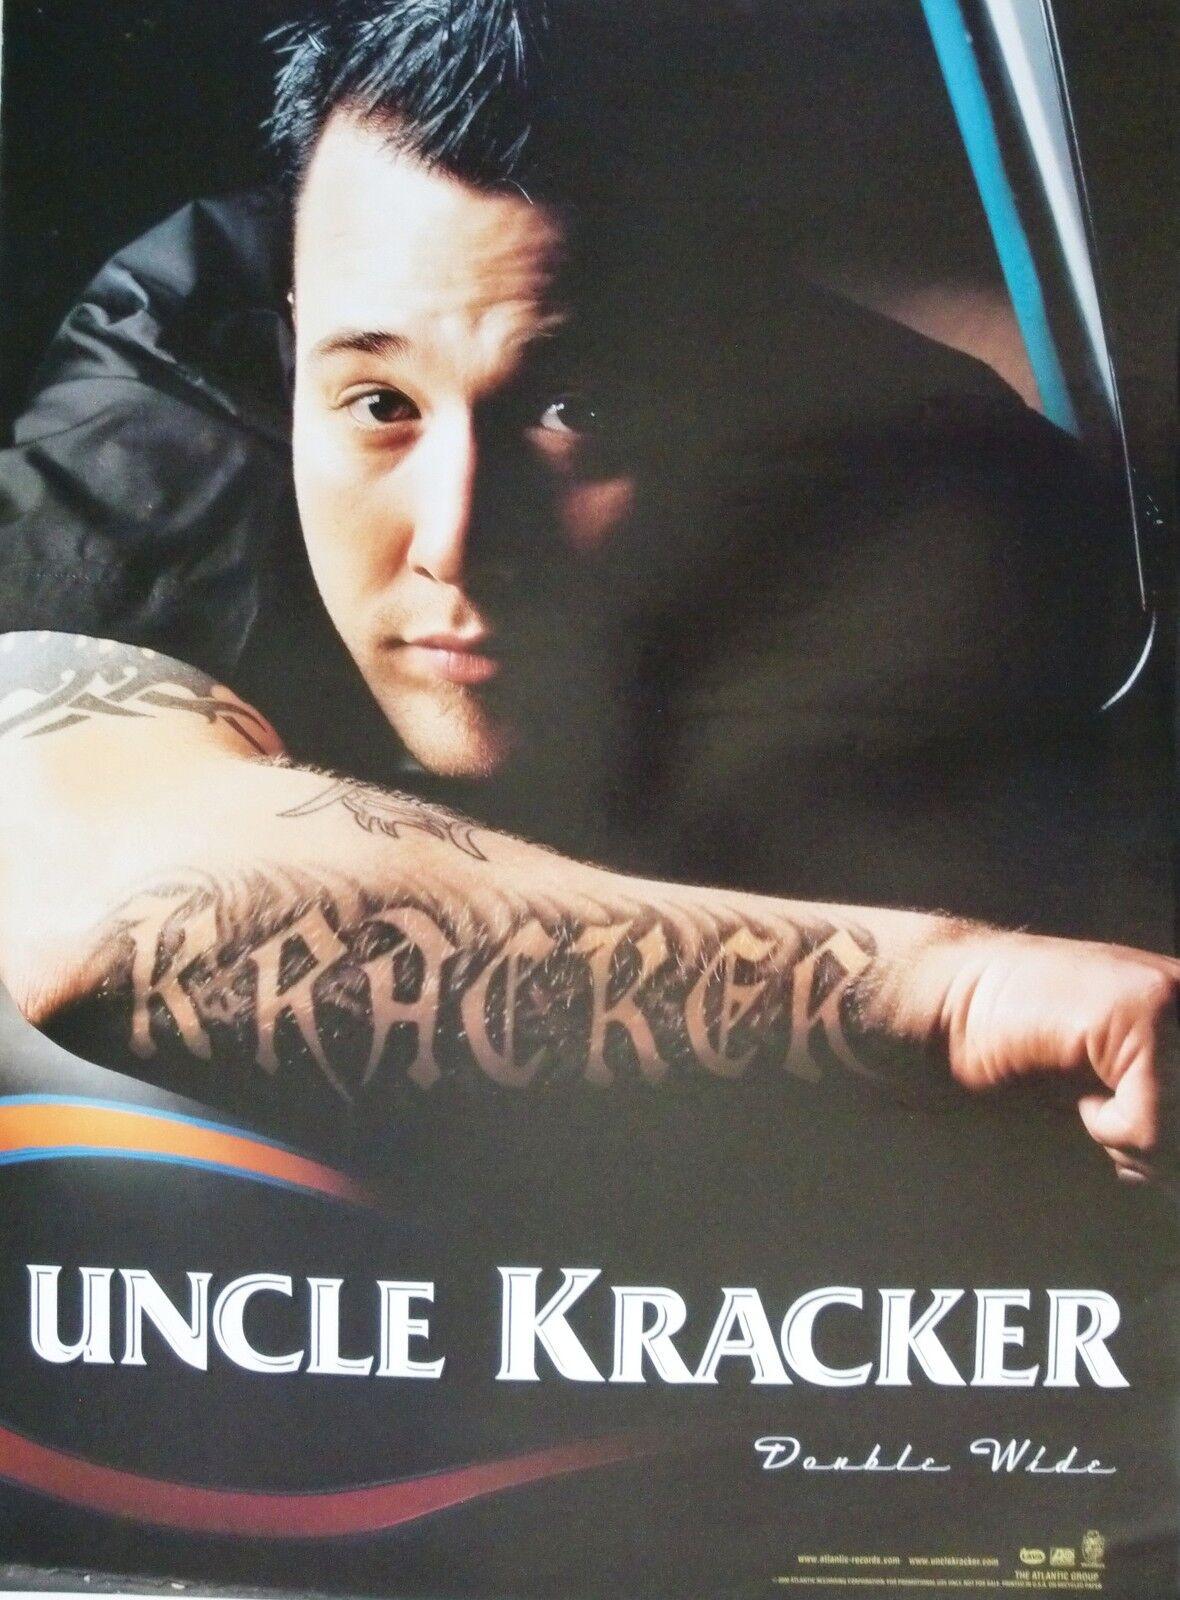 Uncle Kracker Quot Double Wide Quot U S Promo Poster Kid Rock Dj